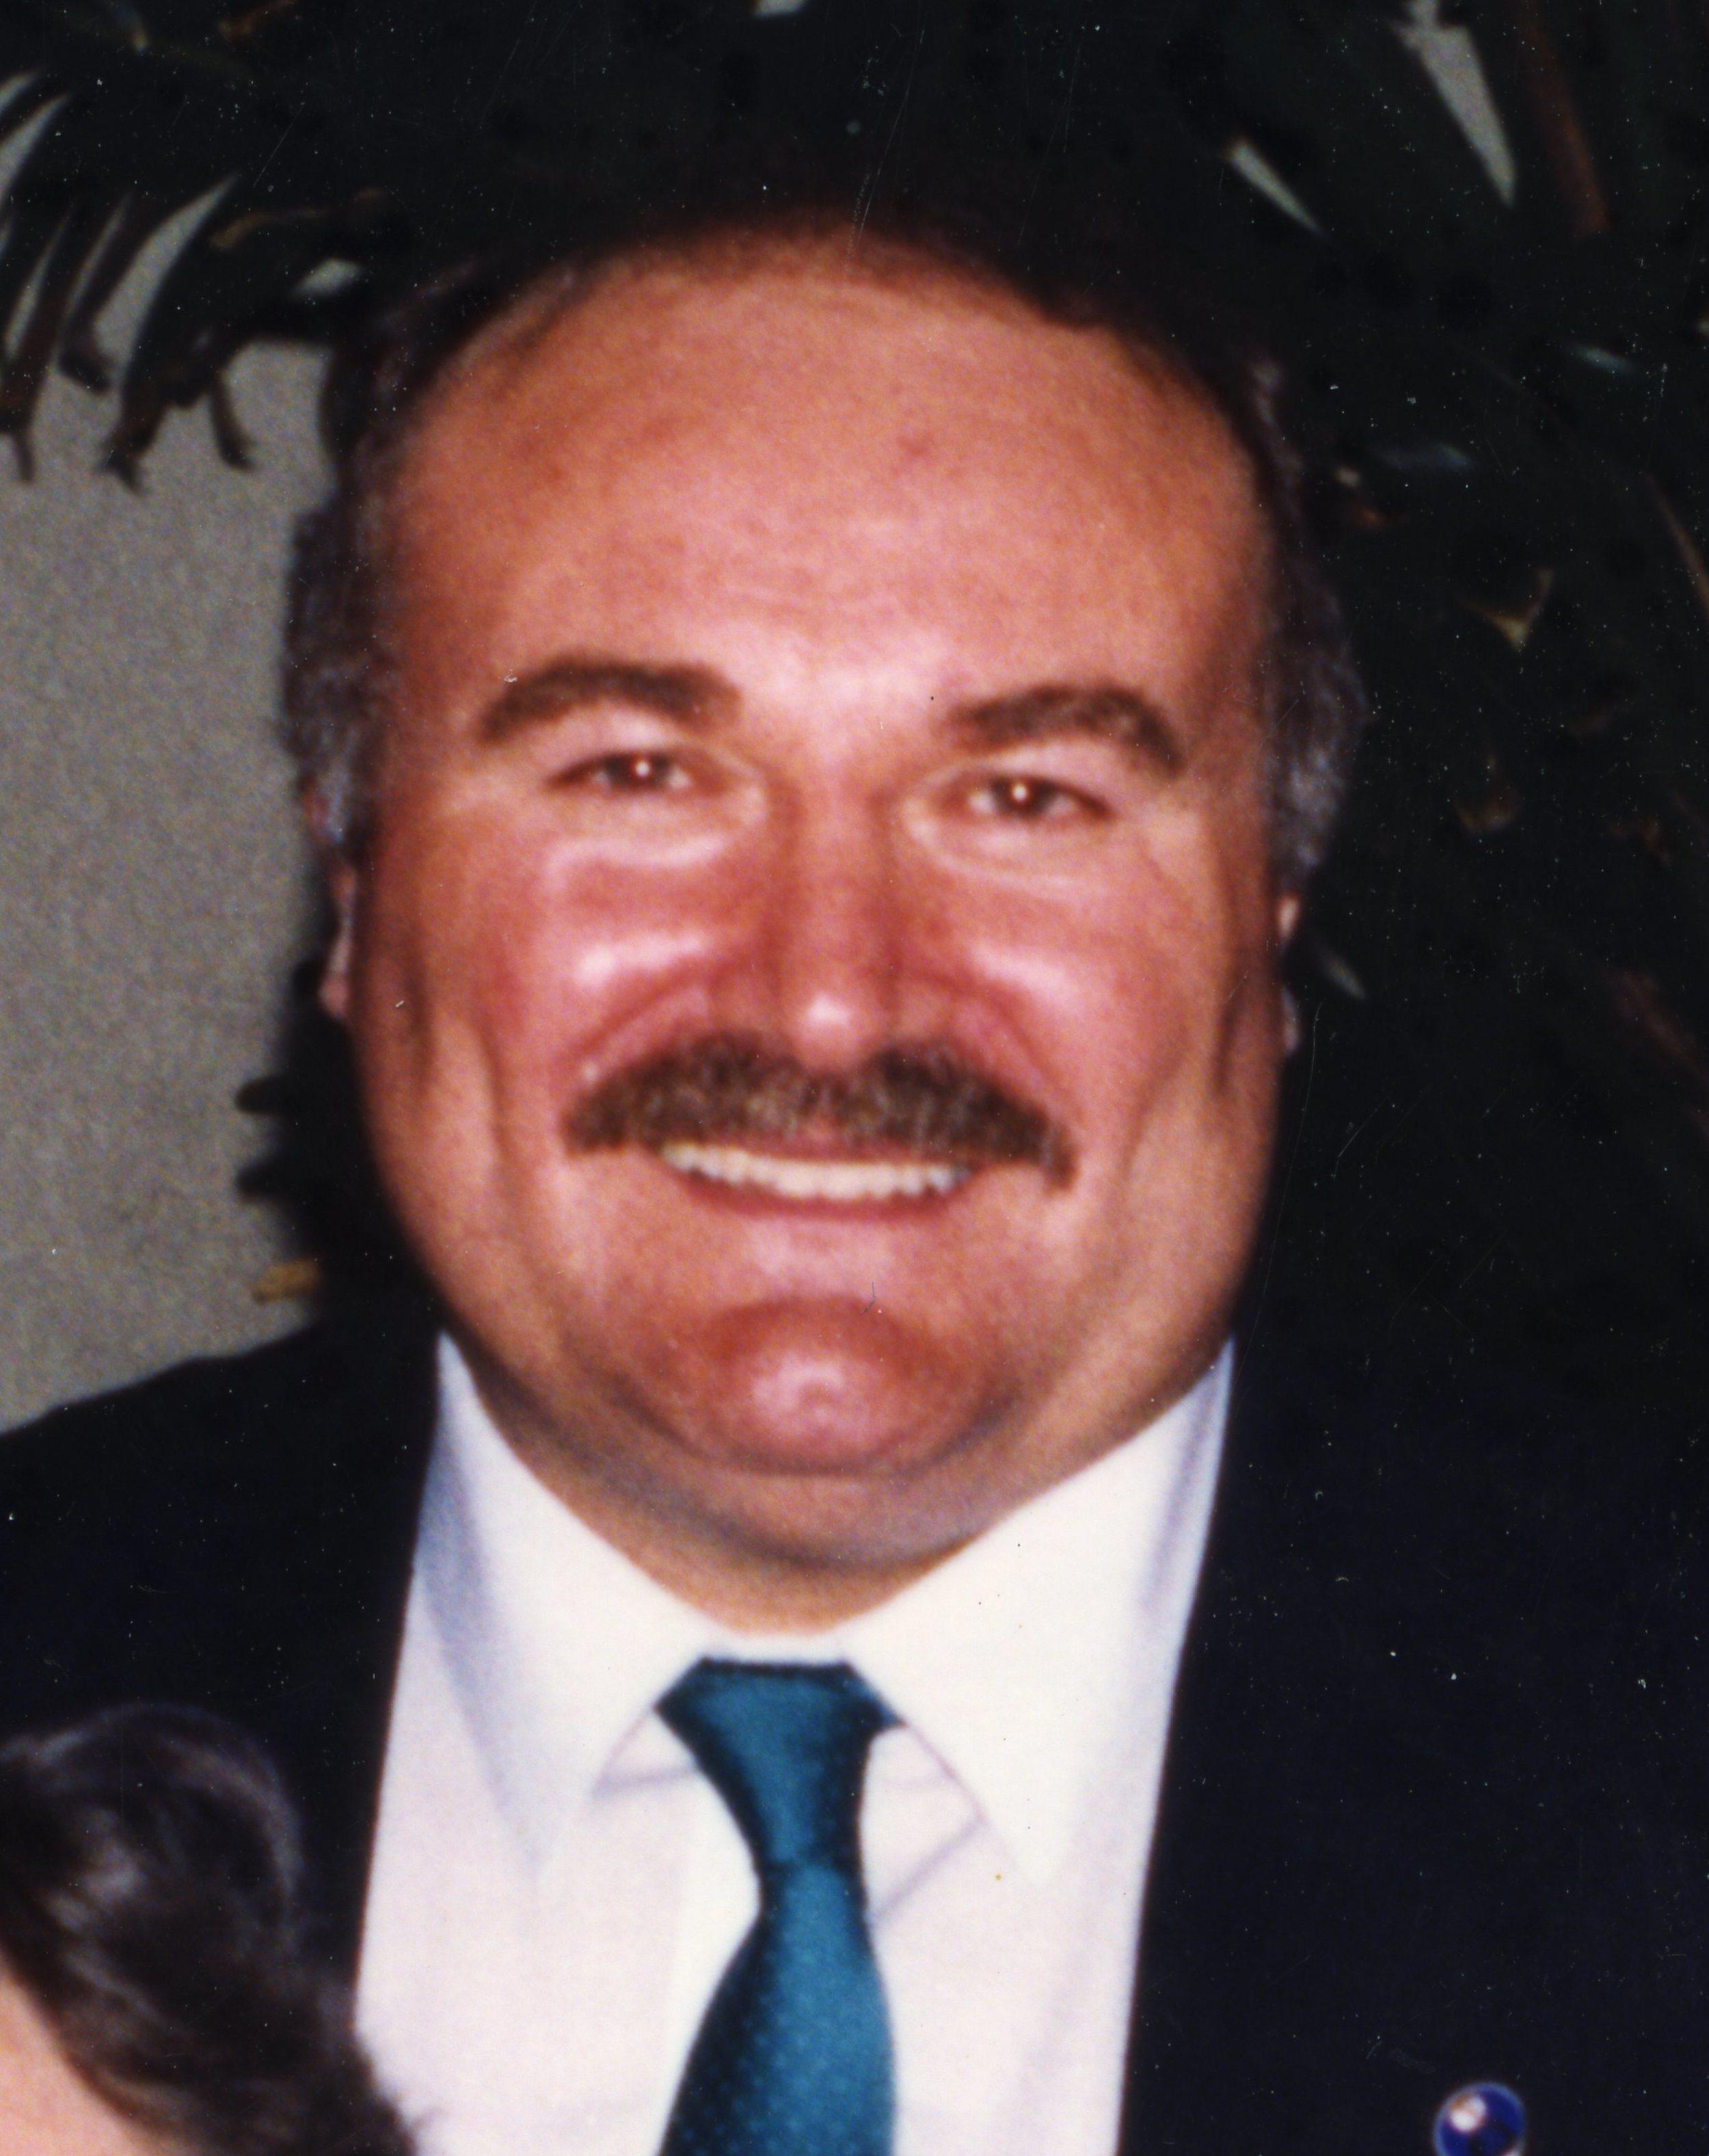 Peter Cipollone